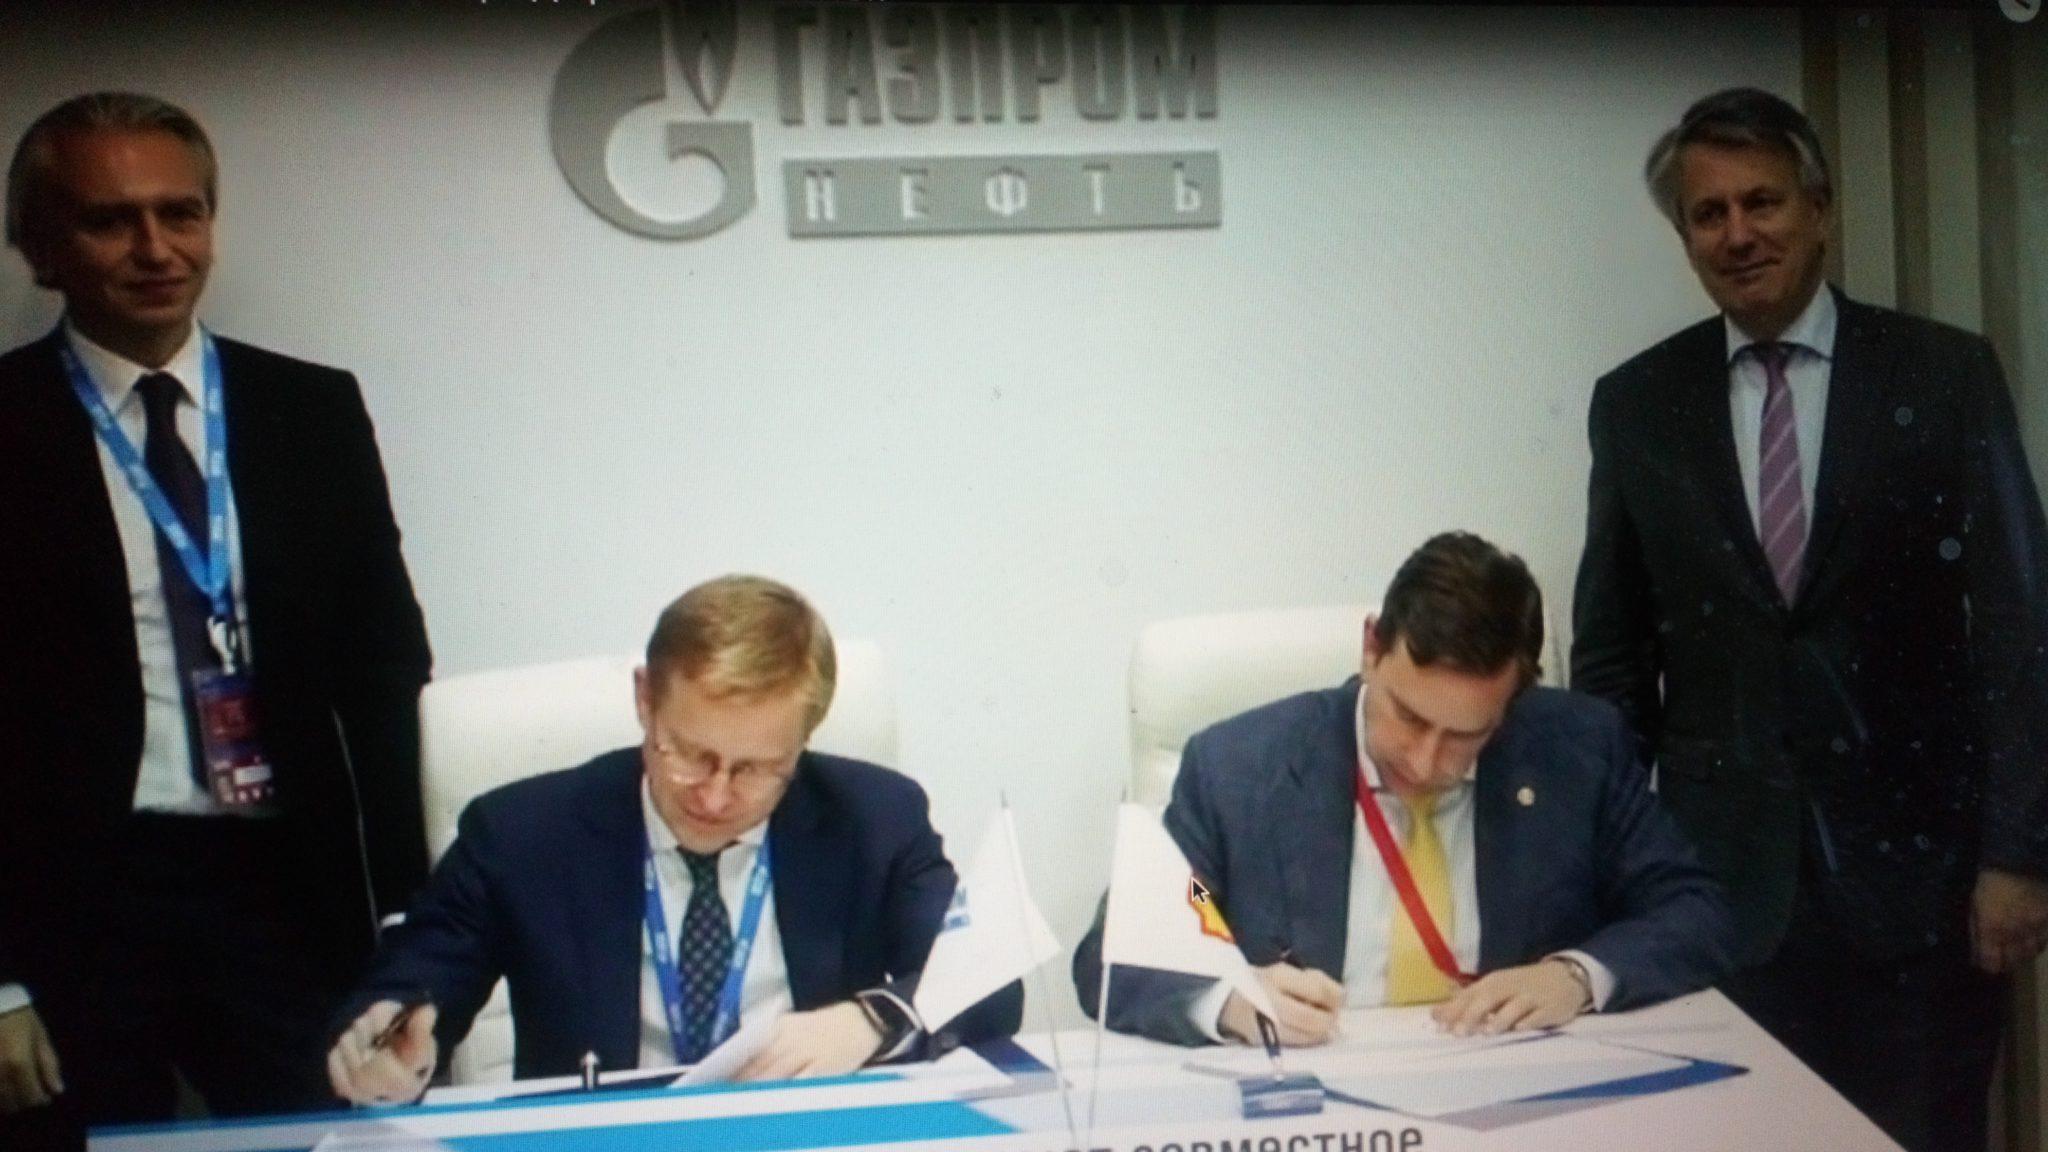 «Меретояханефтегаз» — новое СП «Газпром нефти» и Shell в ЯНАО